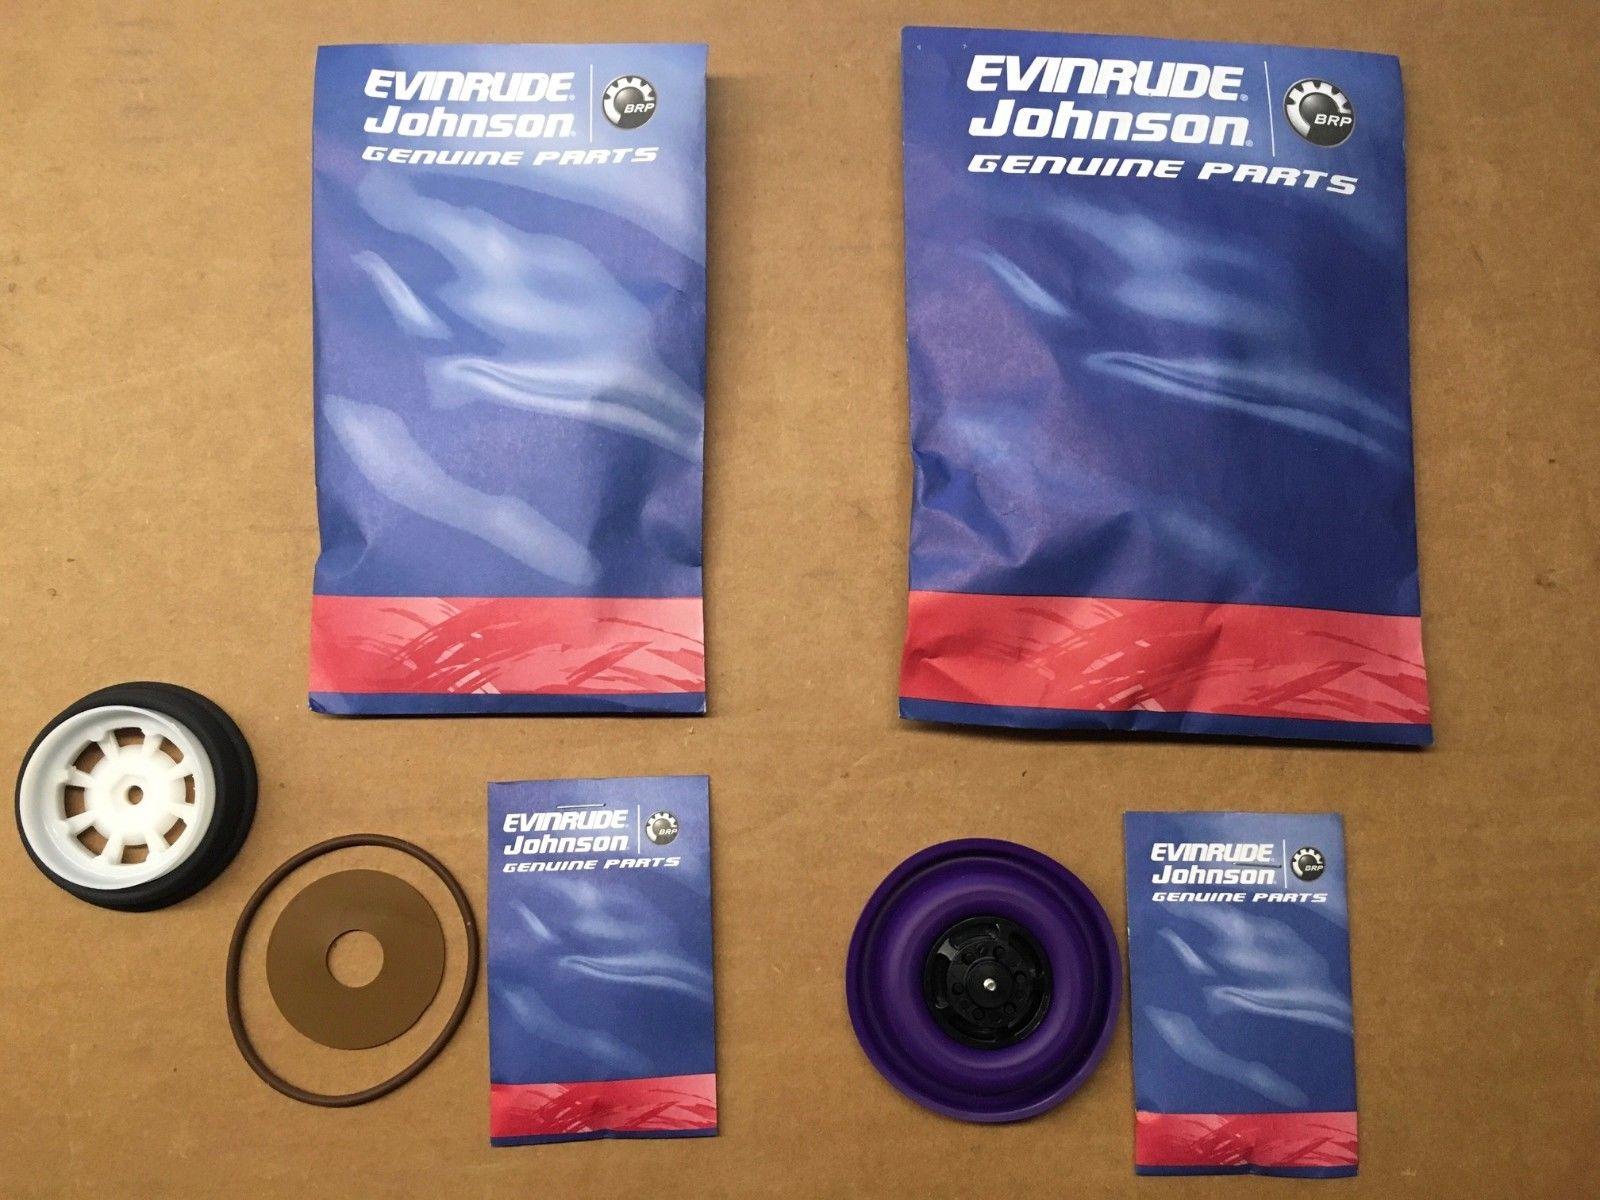 New Johnson Evinrude Outboard VRO Pump Fuel Oil 5007420 - OMC BRP Made in  USA (COPY)